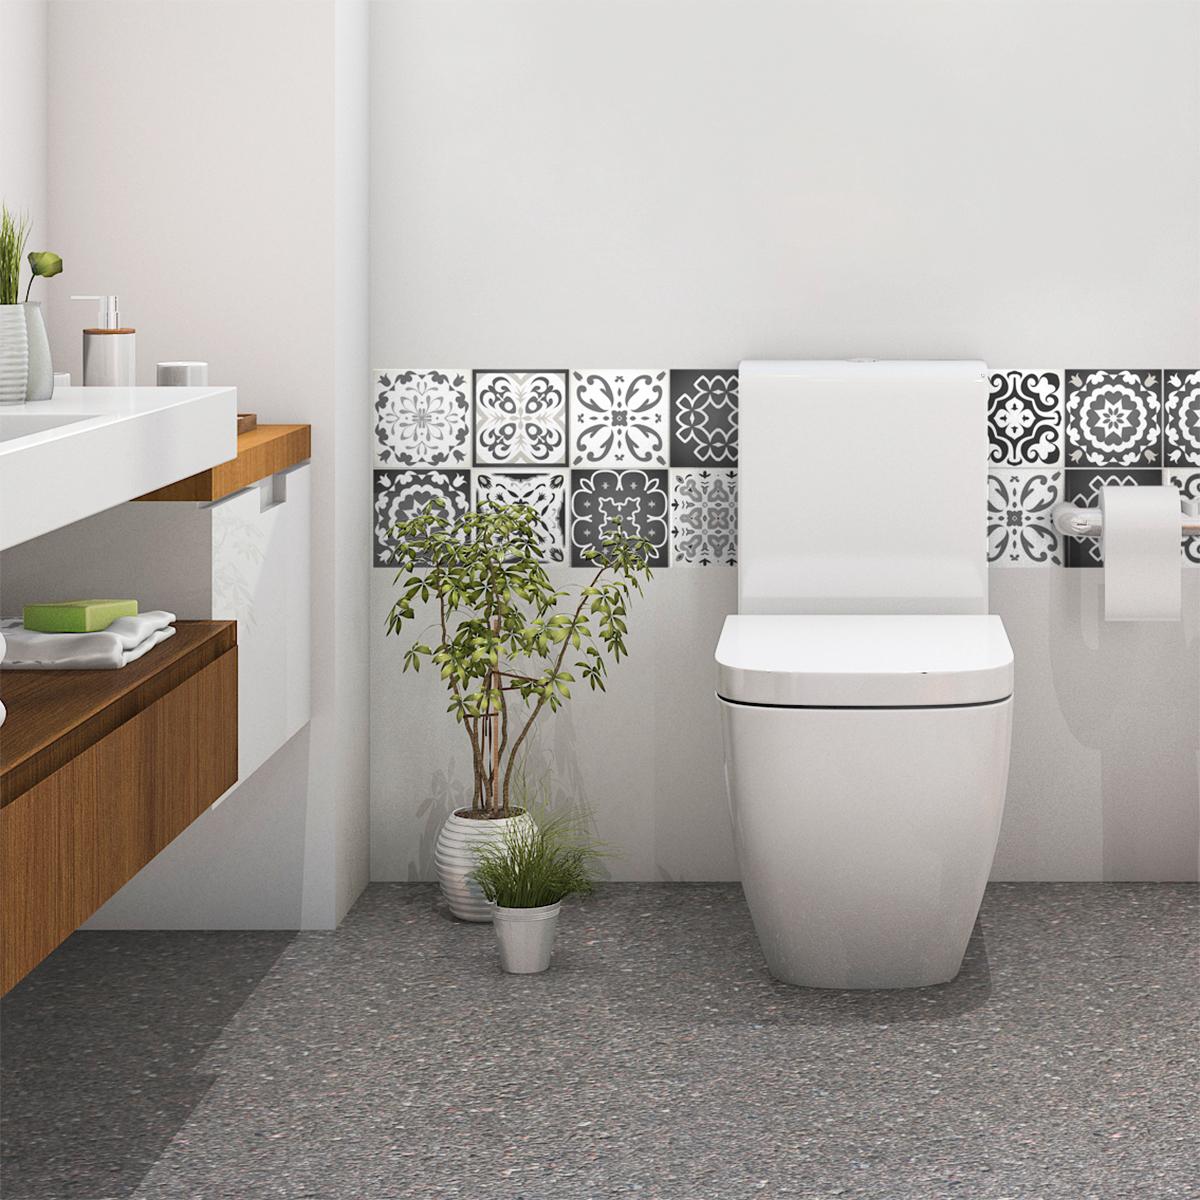 Wc carrelage ciment - Atwebster.fr - Maison et mobilier